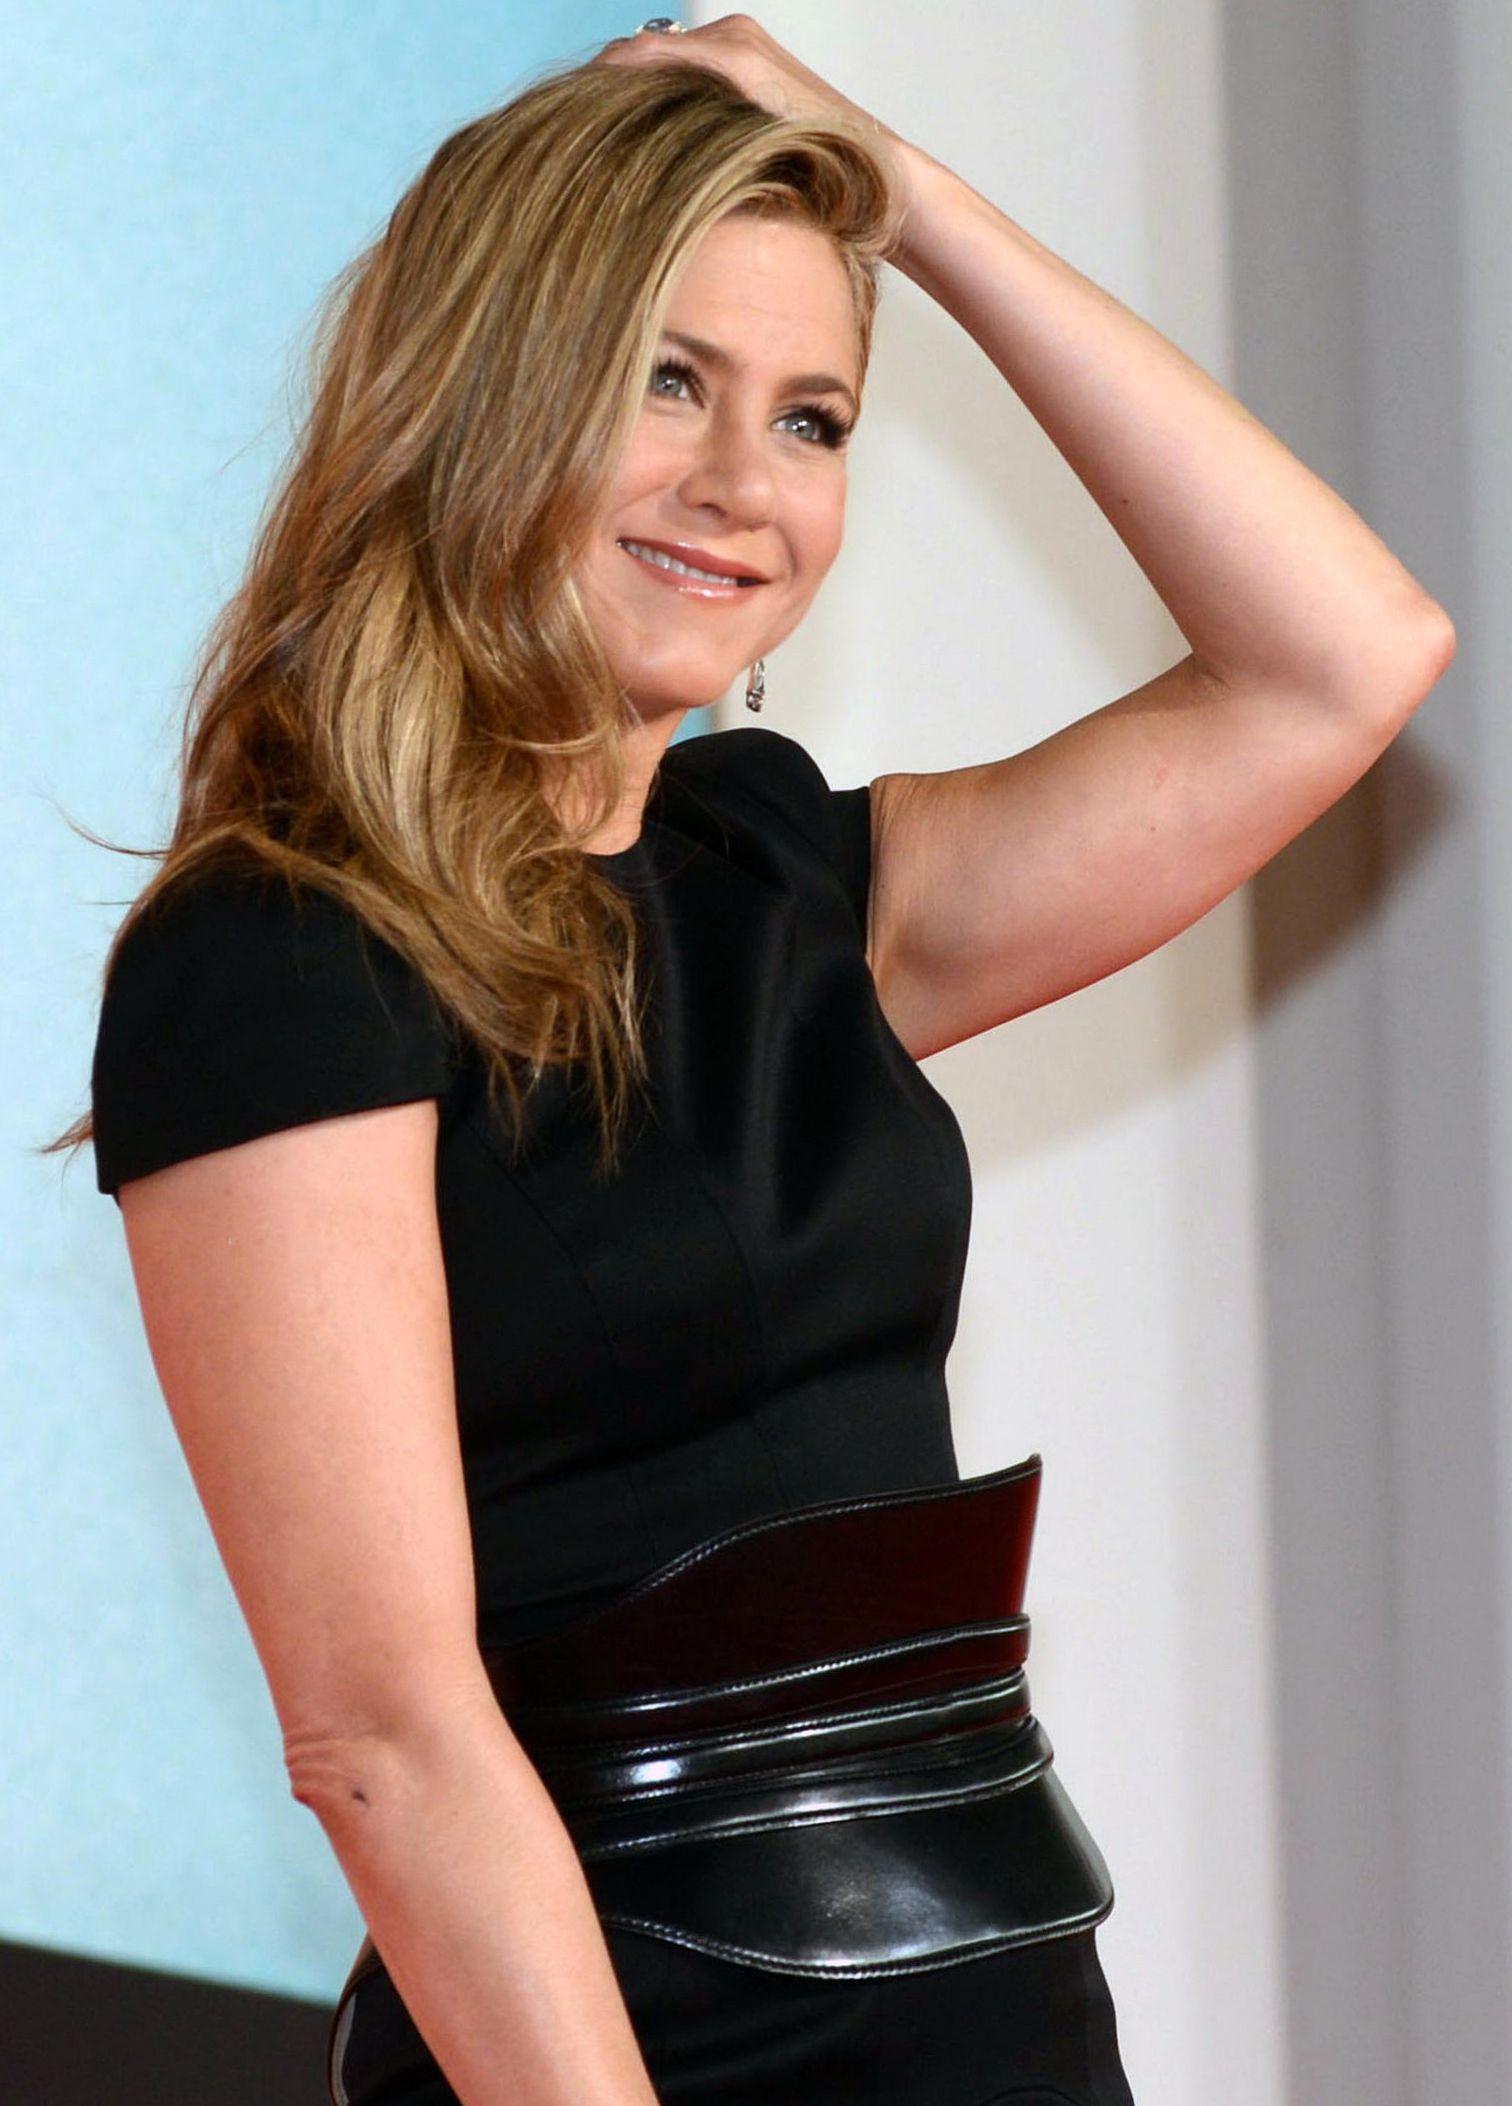 Jennifer Aniston nudes (23 pics), pics Sideboobs, Snapchat, legs 2016